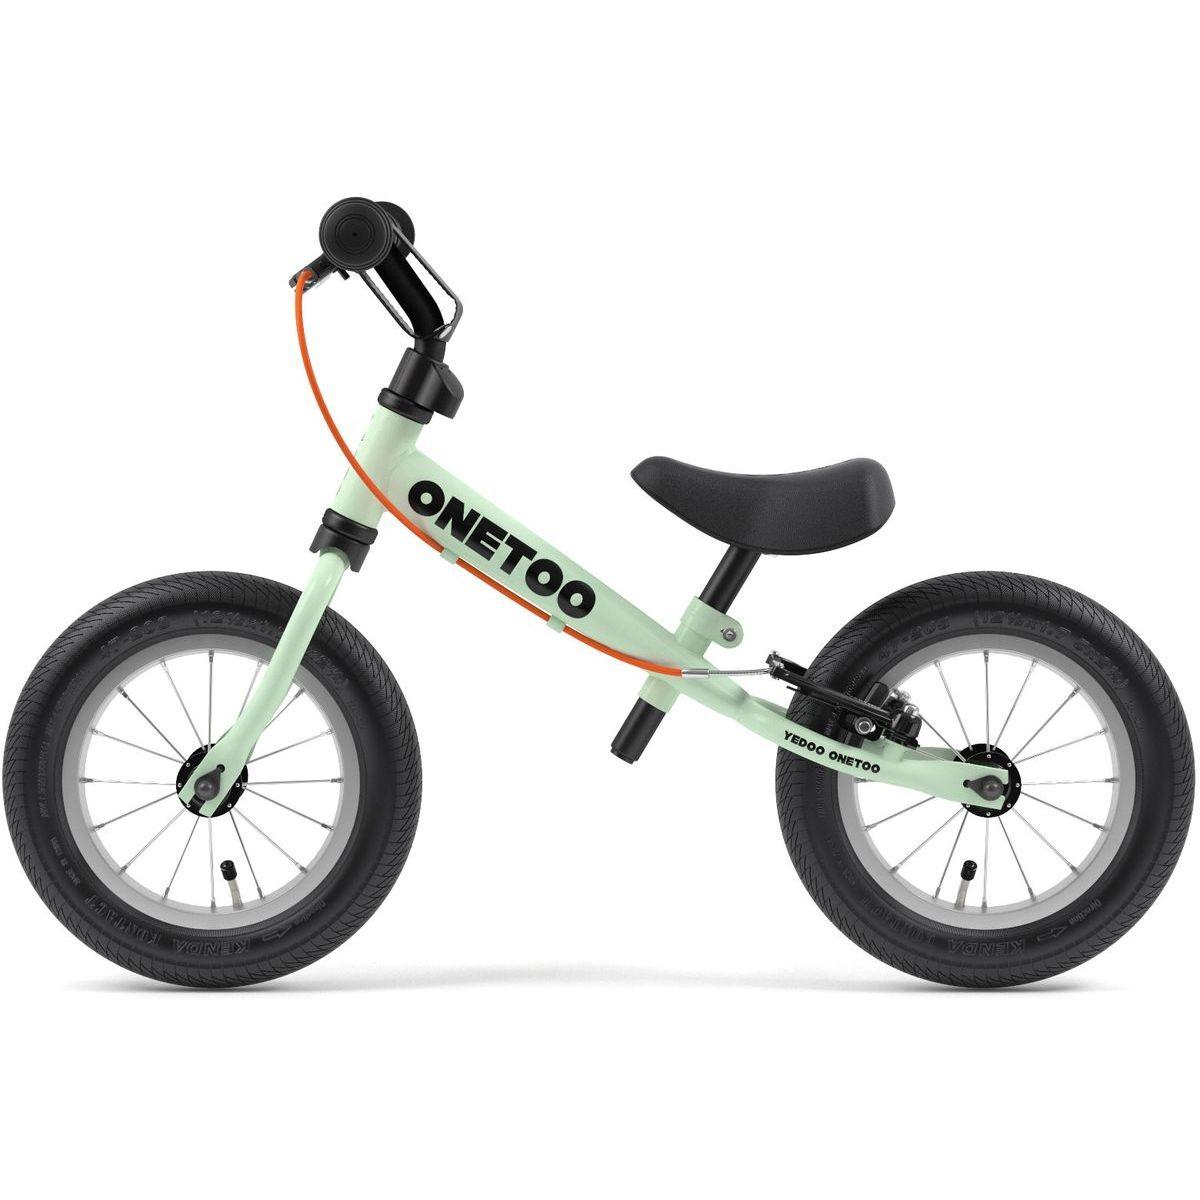 Yedoo Odrážadlo OneToo mint